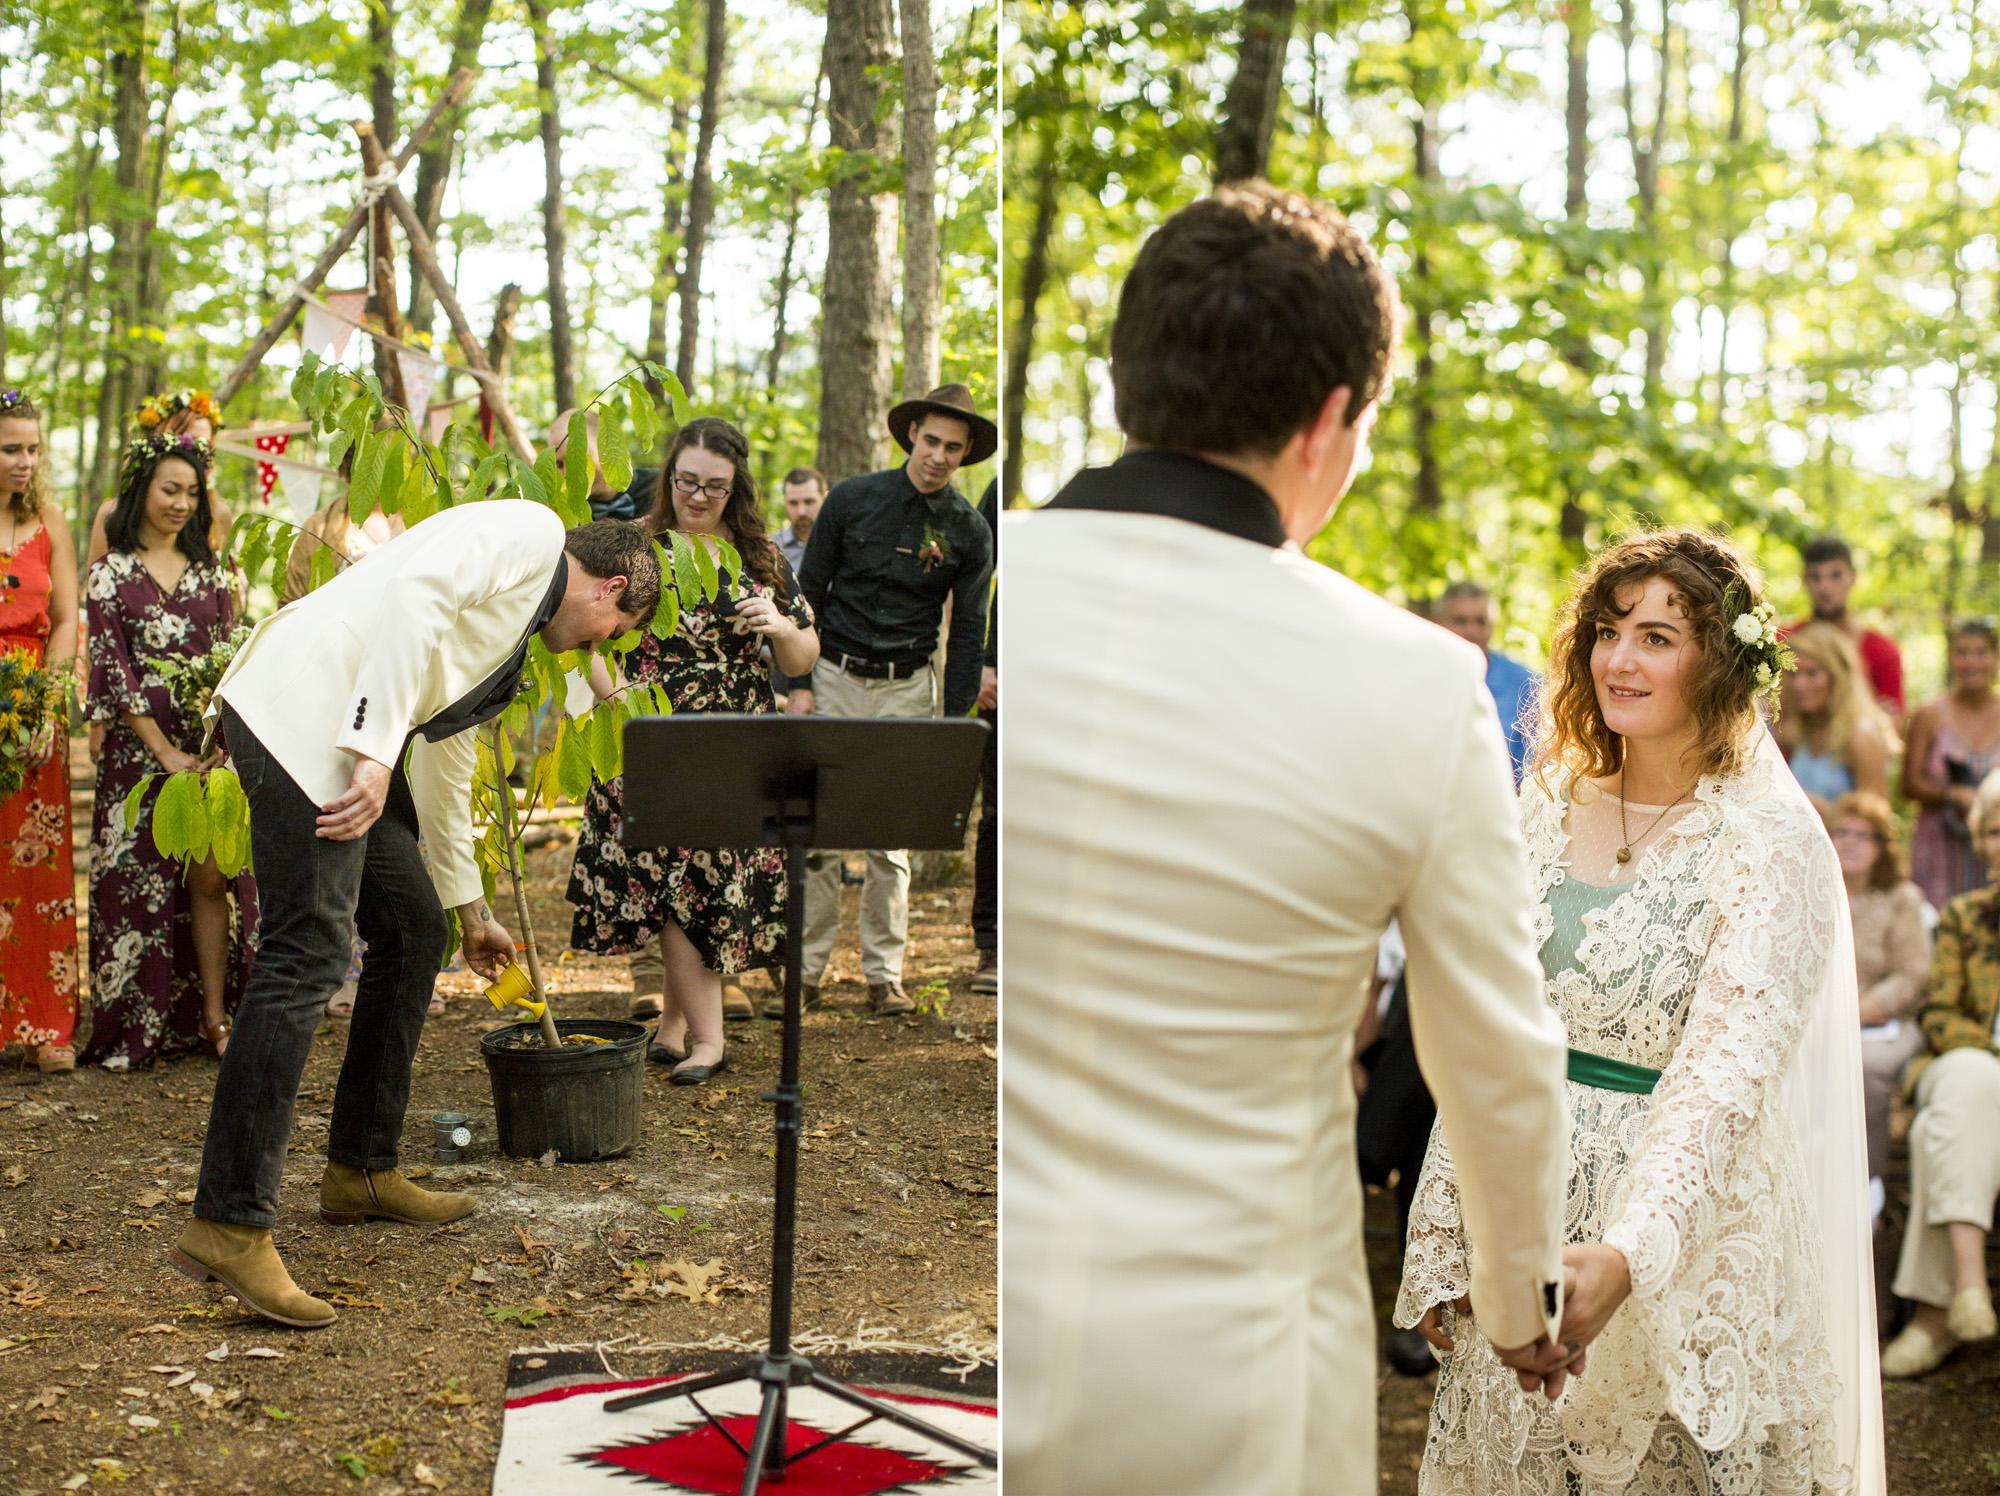 Seriously_Sabrina_Photography_Red_River_Gorge_Kentucky_Wedding_ShawnDana126.jpg